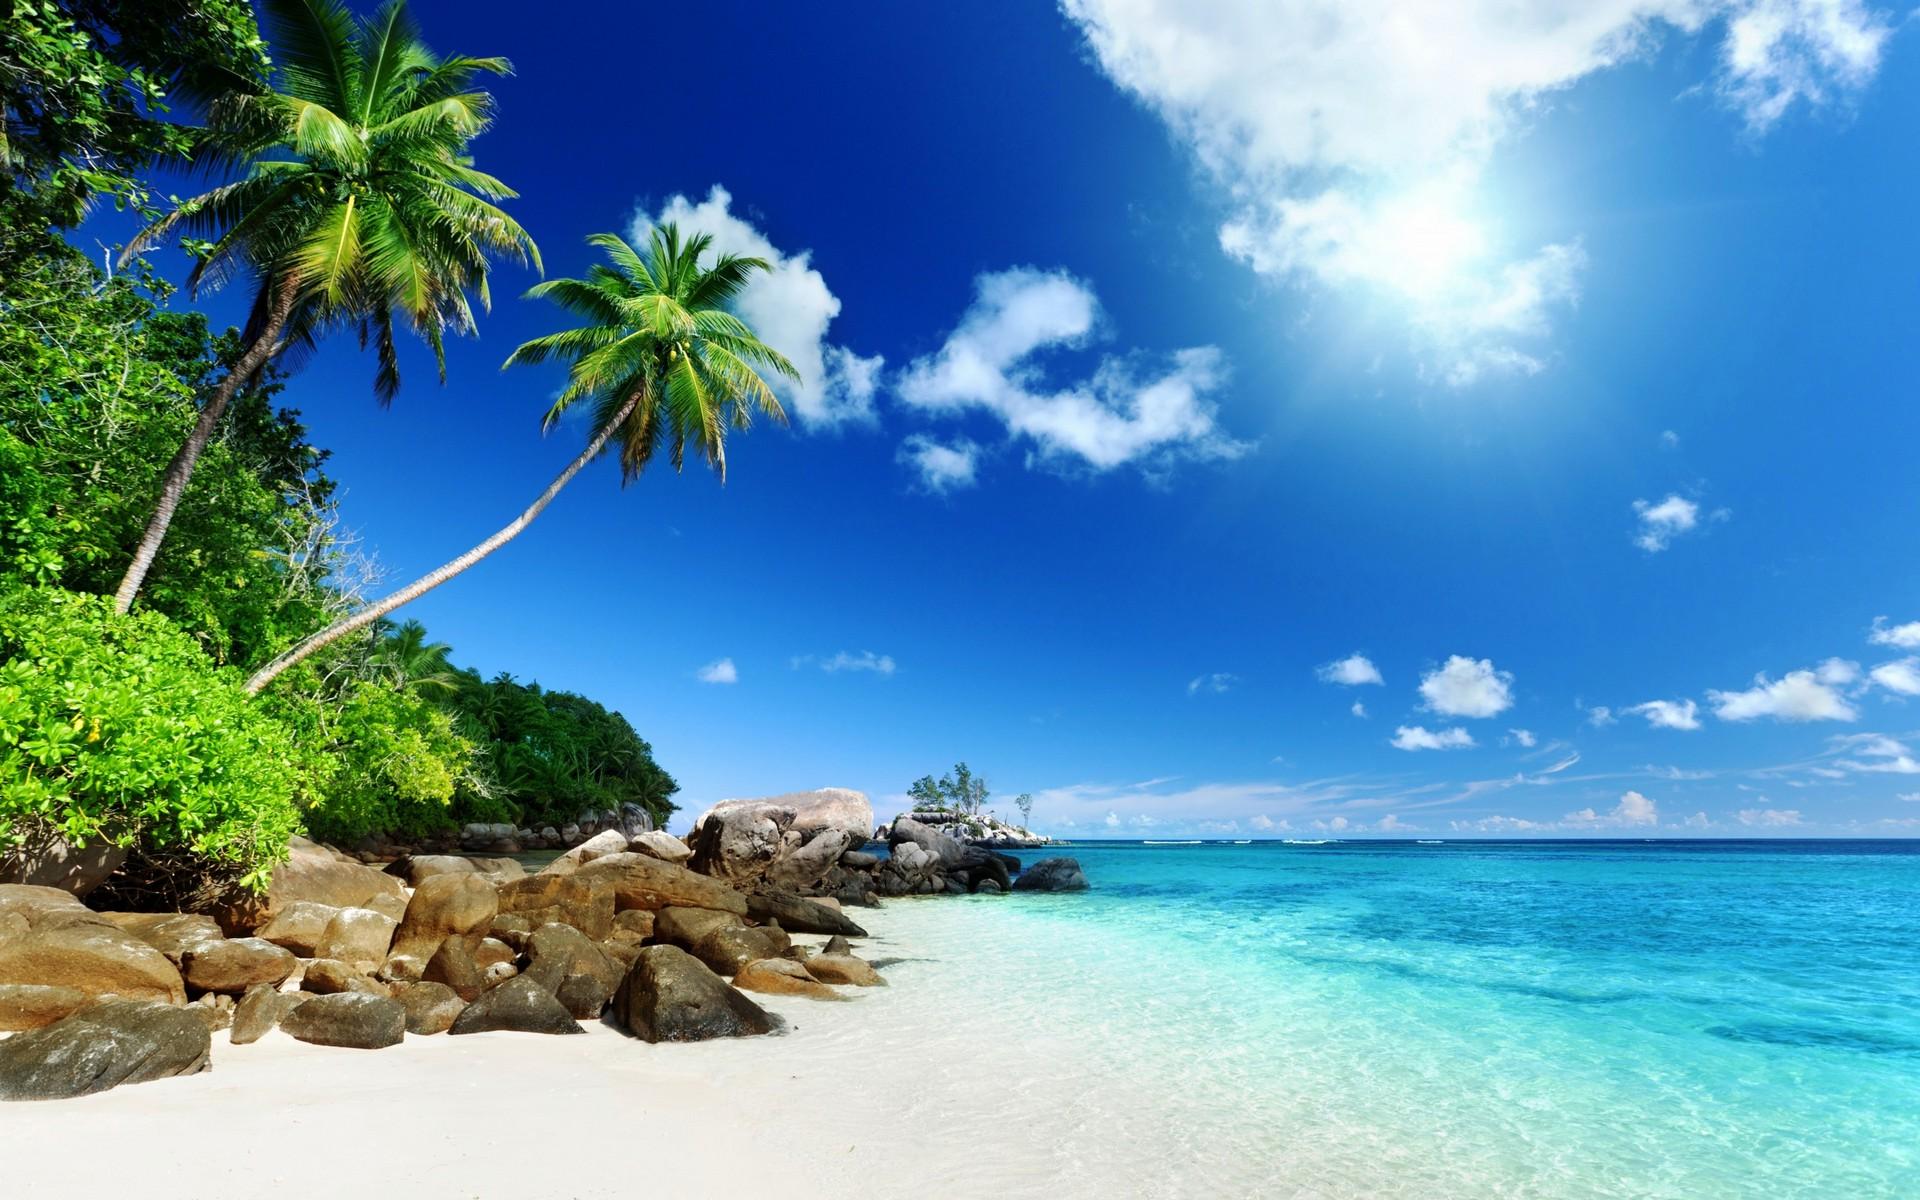 Desktop Wallpaper Tropical Island Pictures 1920x1200